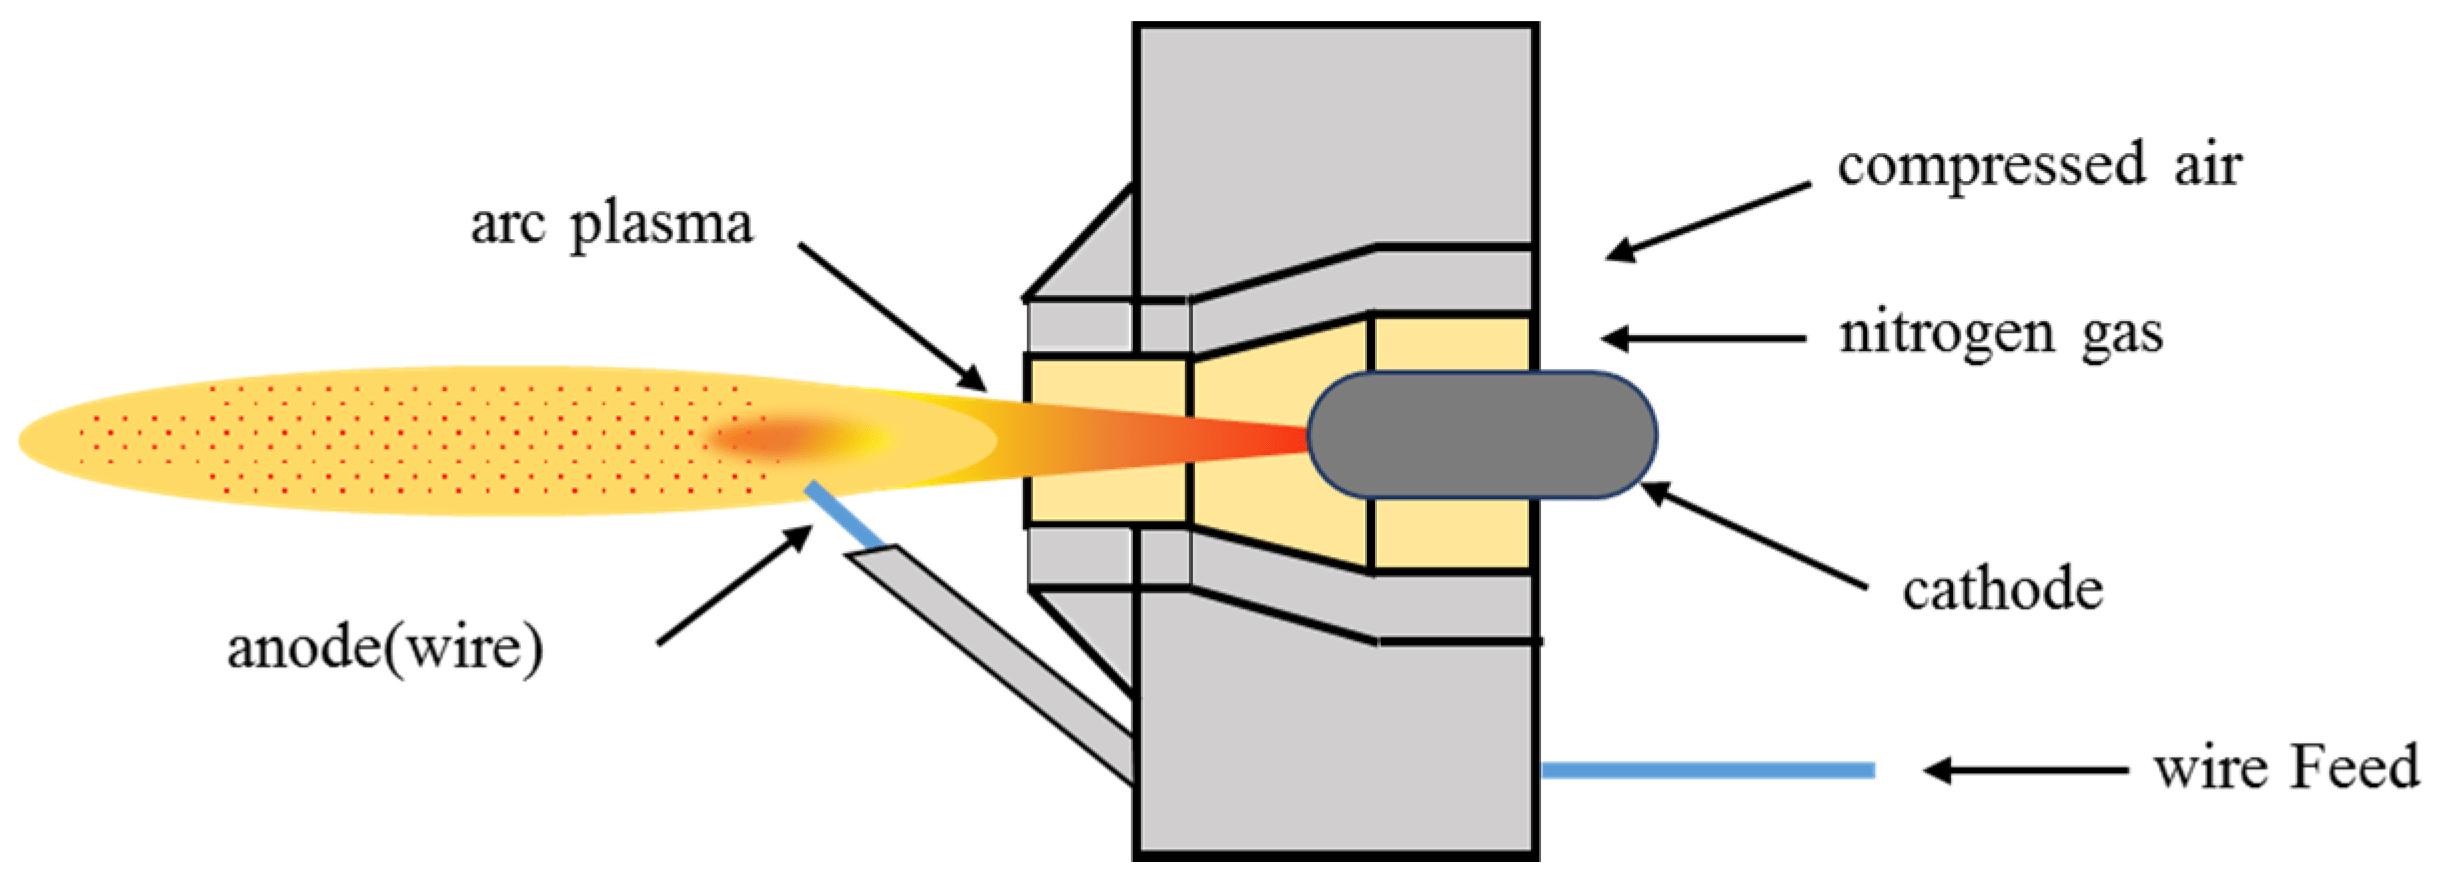 serius electrical wire diagram fog light